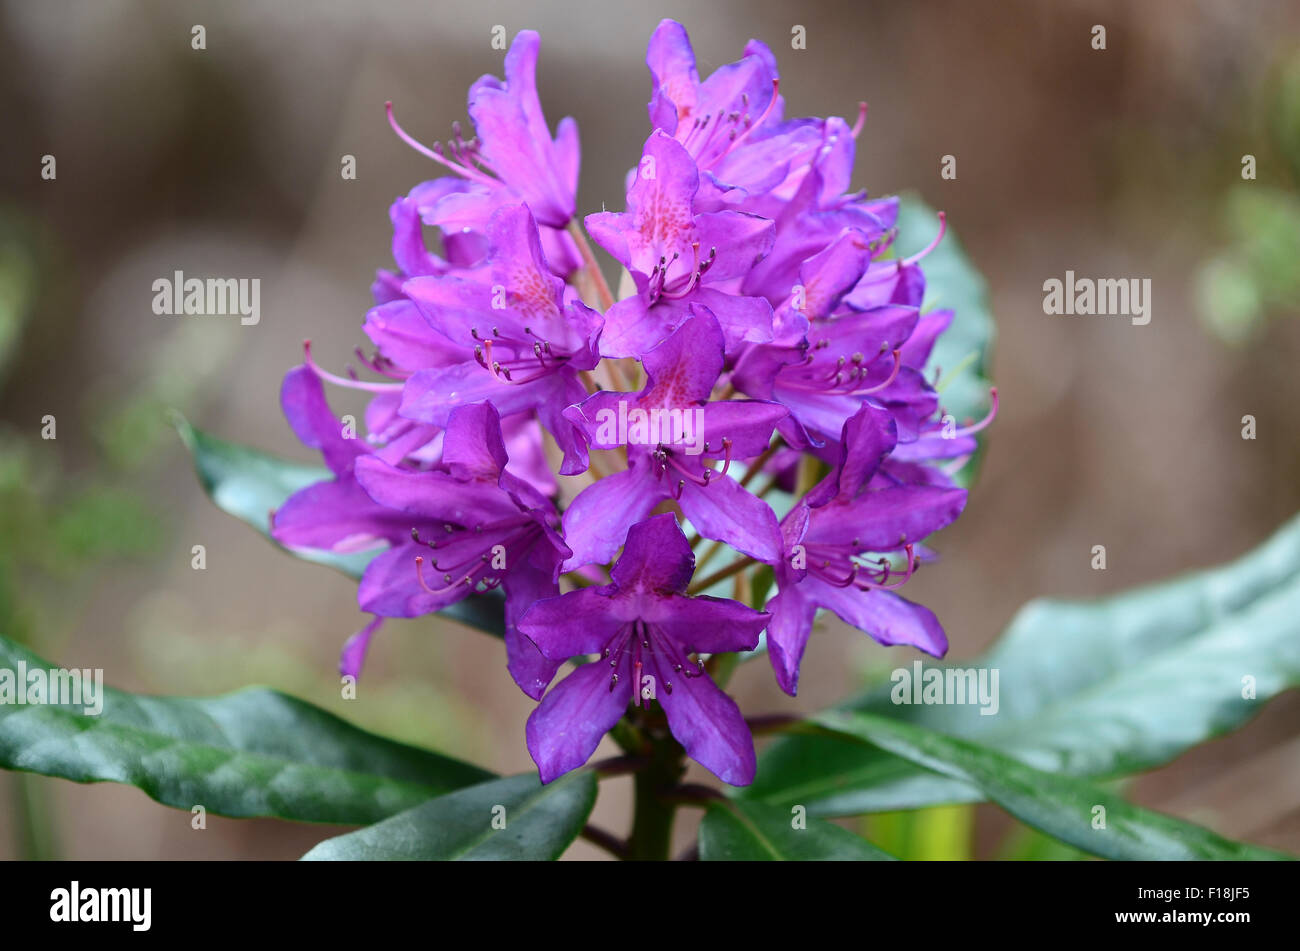 Rhododendron flower head purple UK - Stock Image